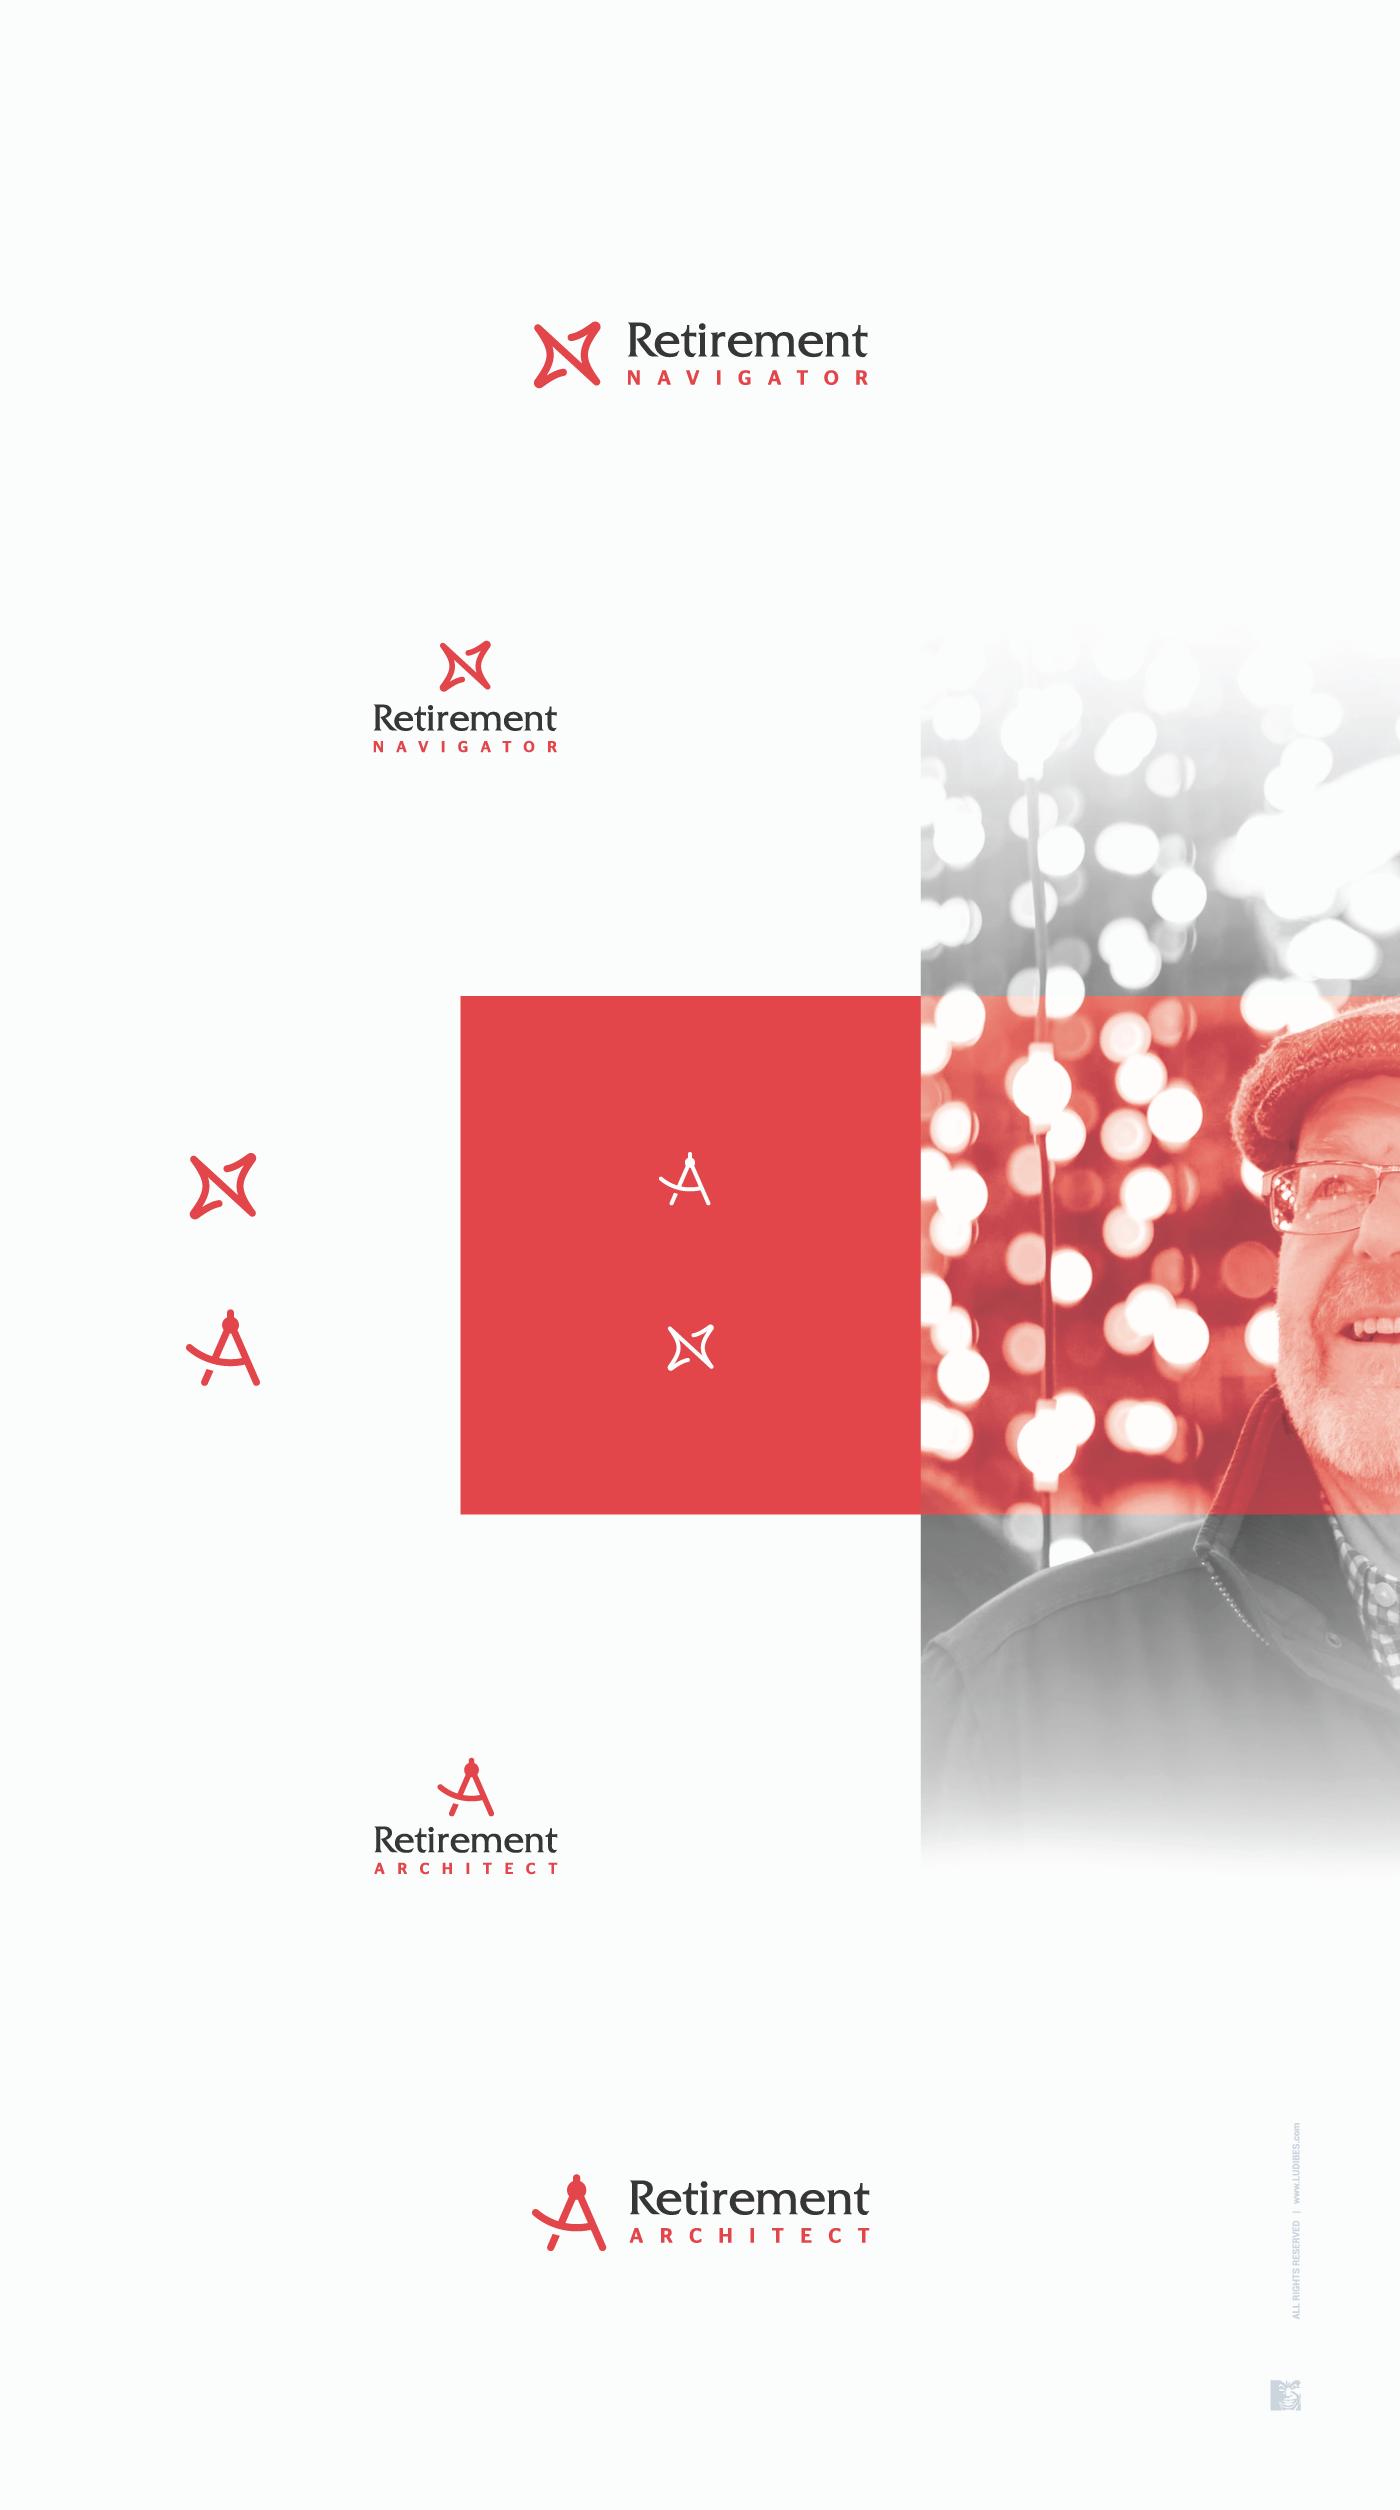 Retirement Architect and Retirement Navigator (2 logos)